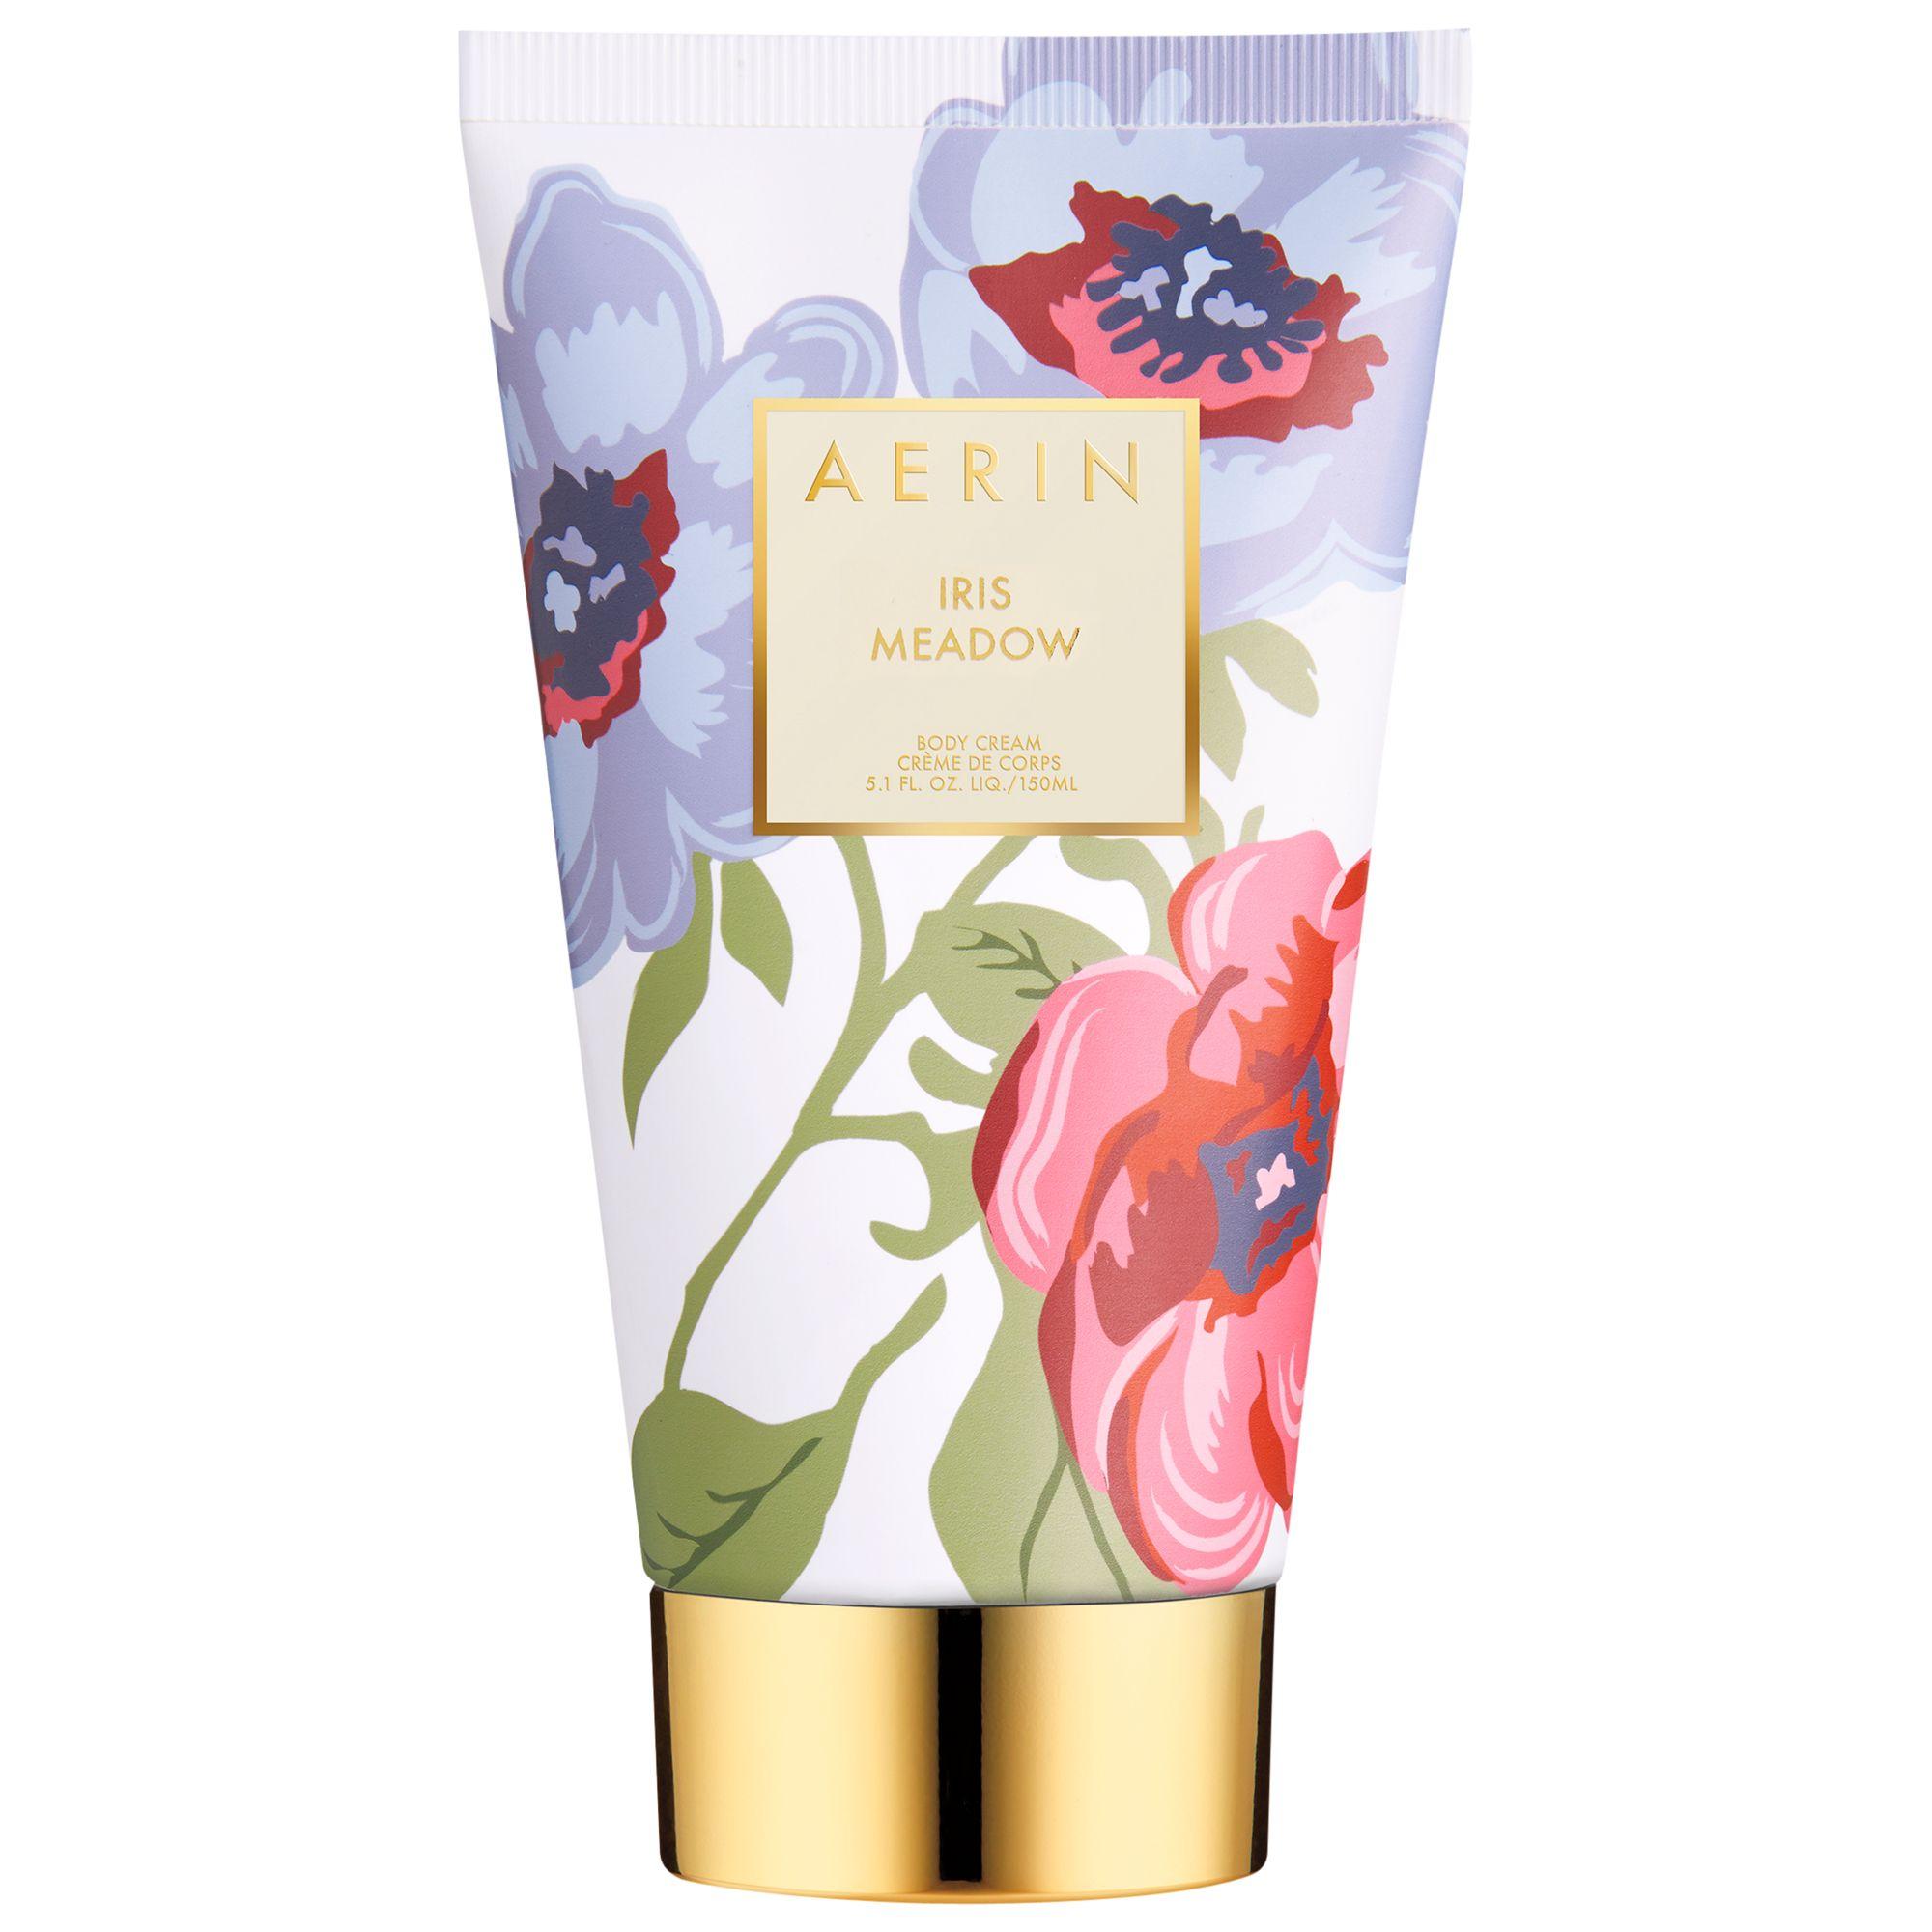 AERIN AERIN Iris Meadow Body Cream, 150ml